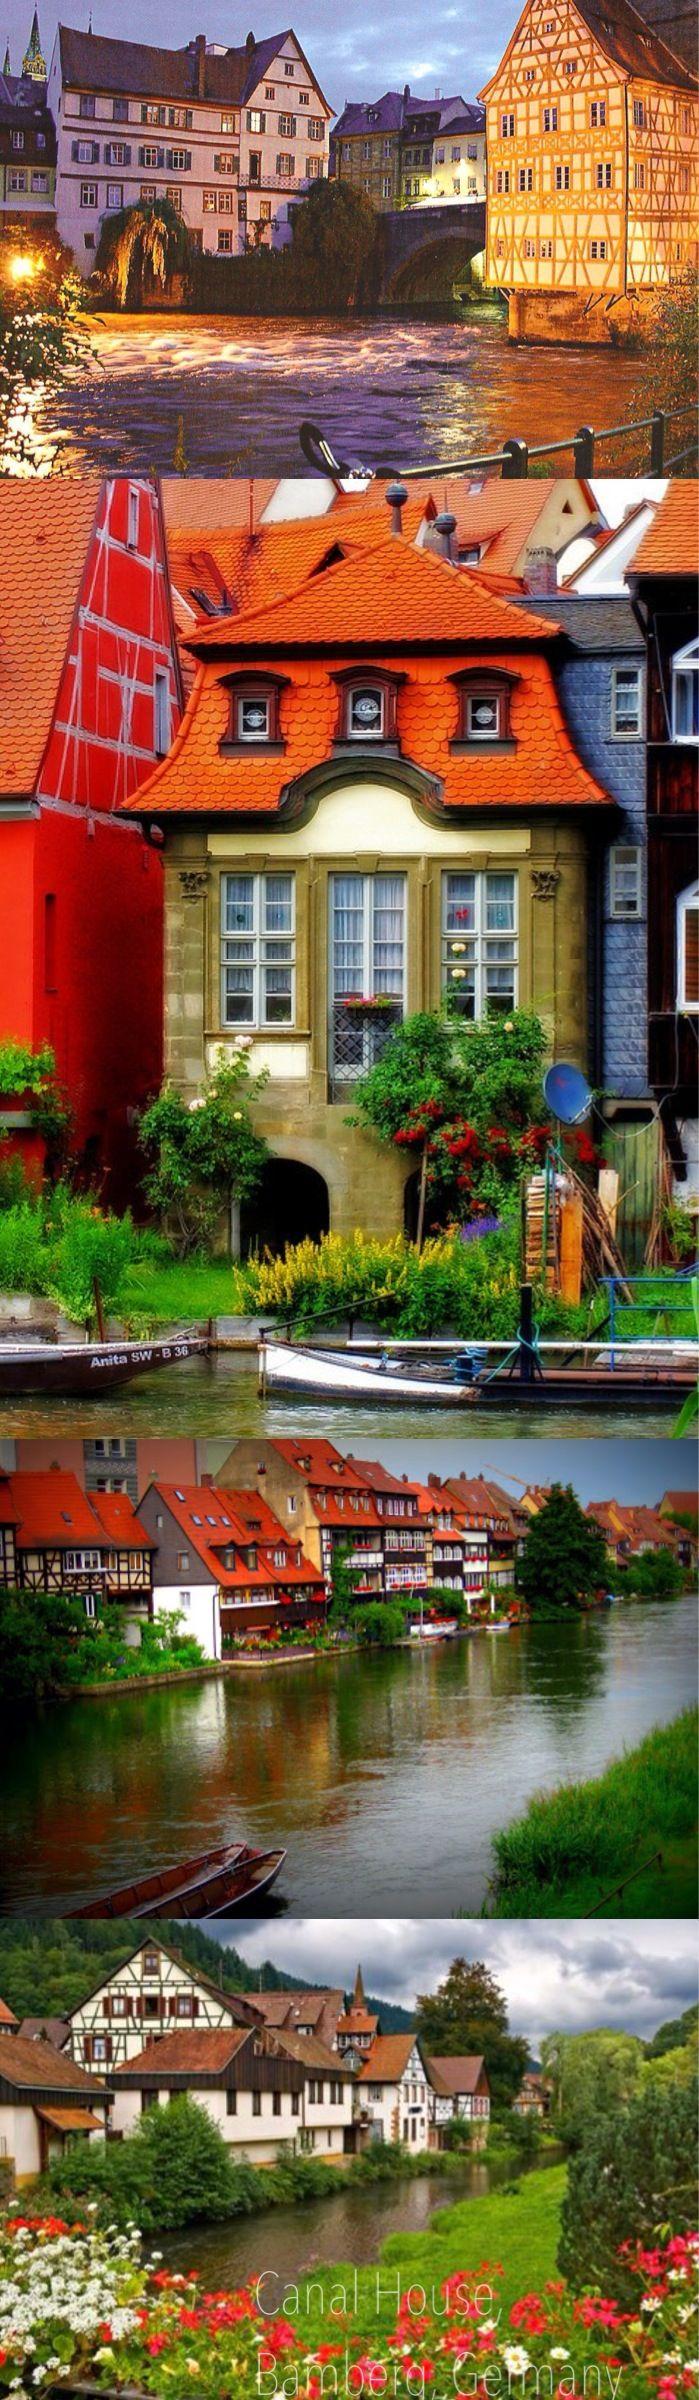 Germany Canal House, Bamberg, Germany